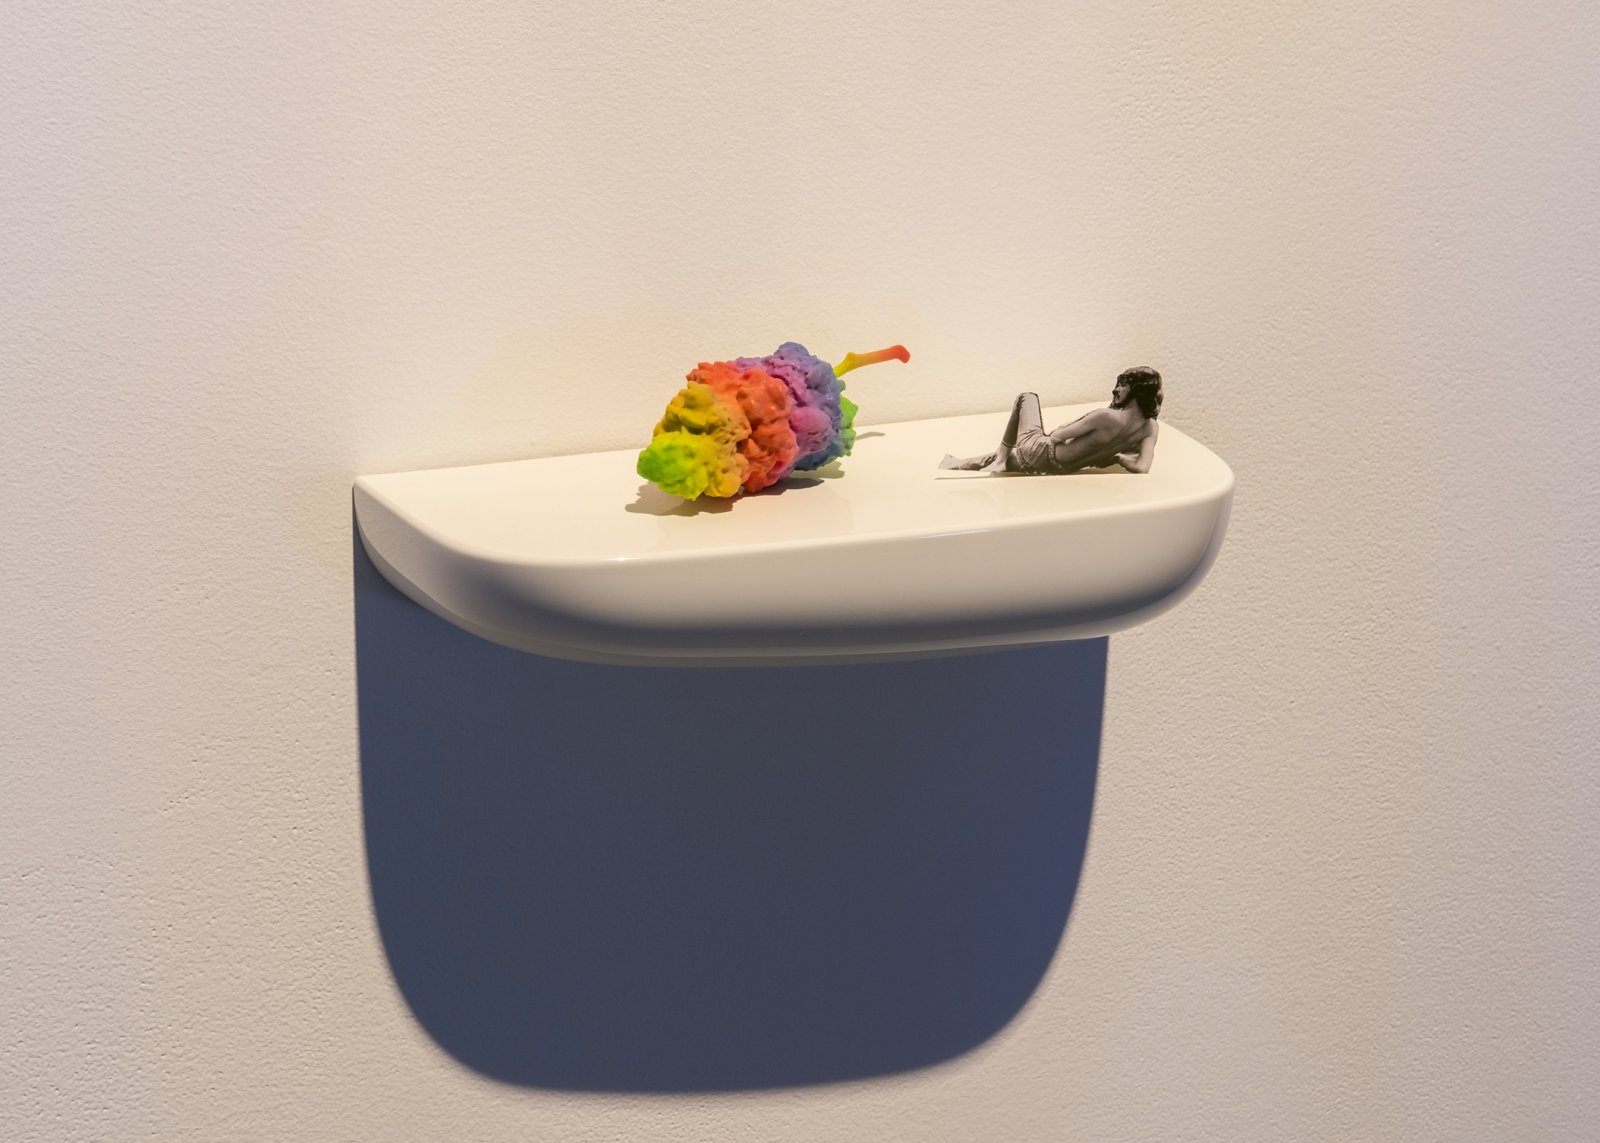 Myfanwy MacLeod, Sweet Mary Jane I, 2015, 3D printed sandstone marijuana bud, plastic shell, 6 x 14 x 6 in. (14 x 36 x 15 cm) by Myfanwy MacLeod